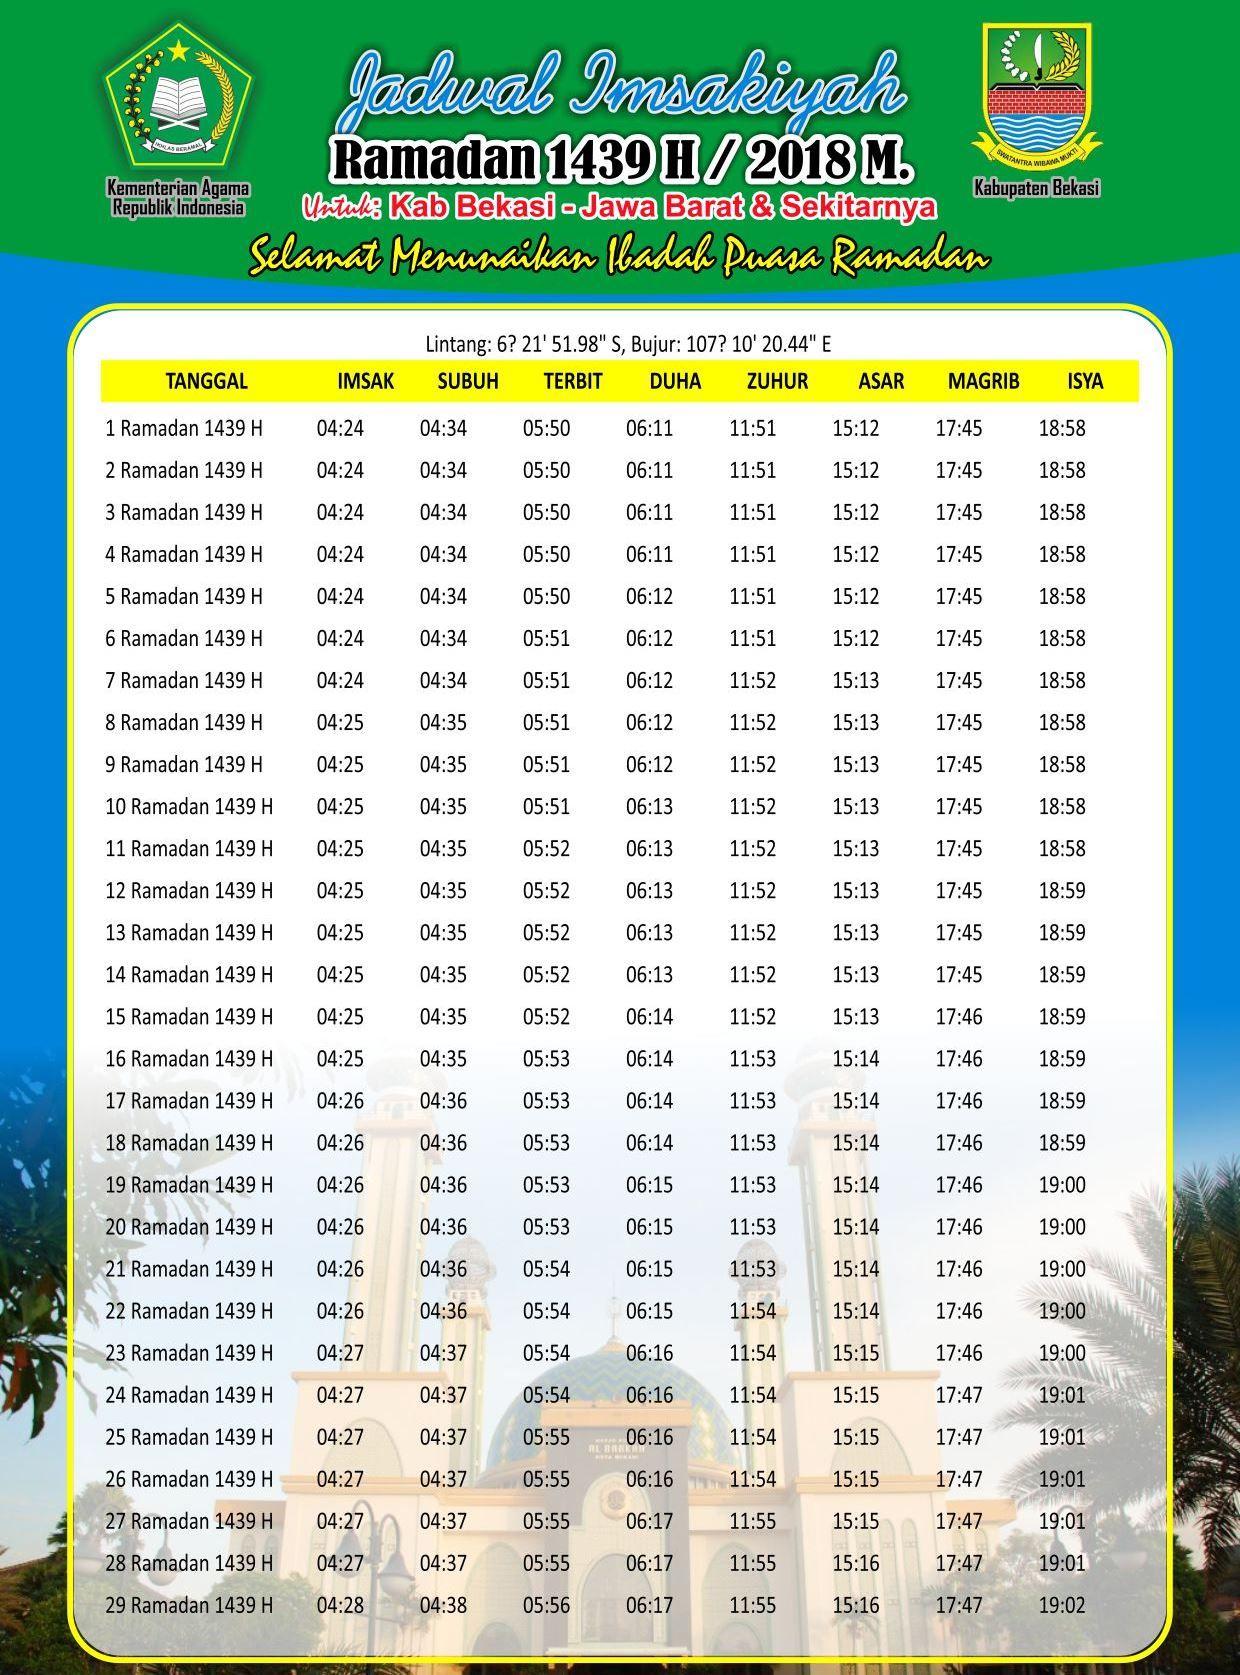 Imsakiyyah Puasa Ramadhan 1439 H 2018 Jadwal Free Download